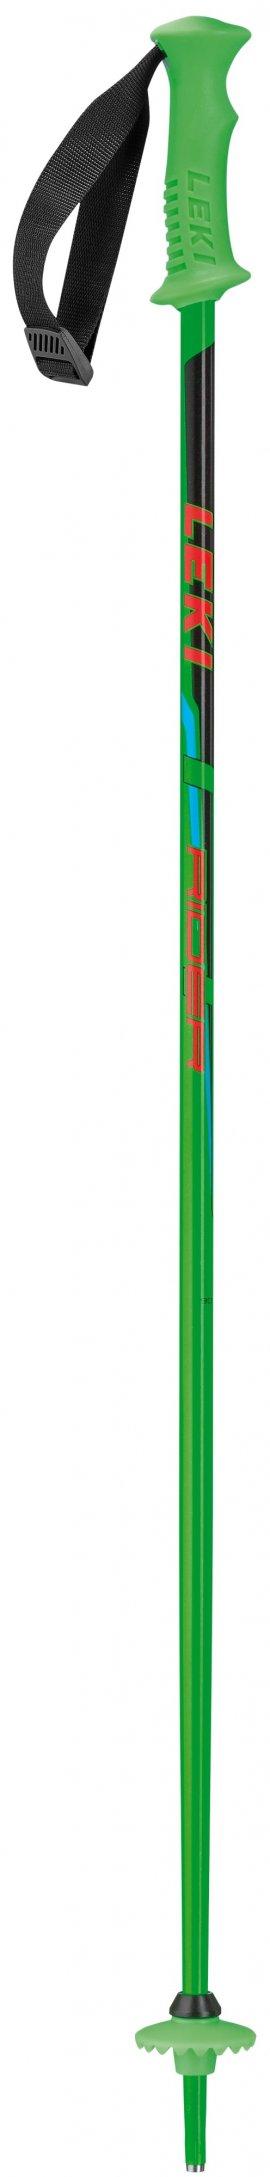 LEKI RIDER, neon green, 90 cm